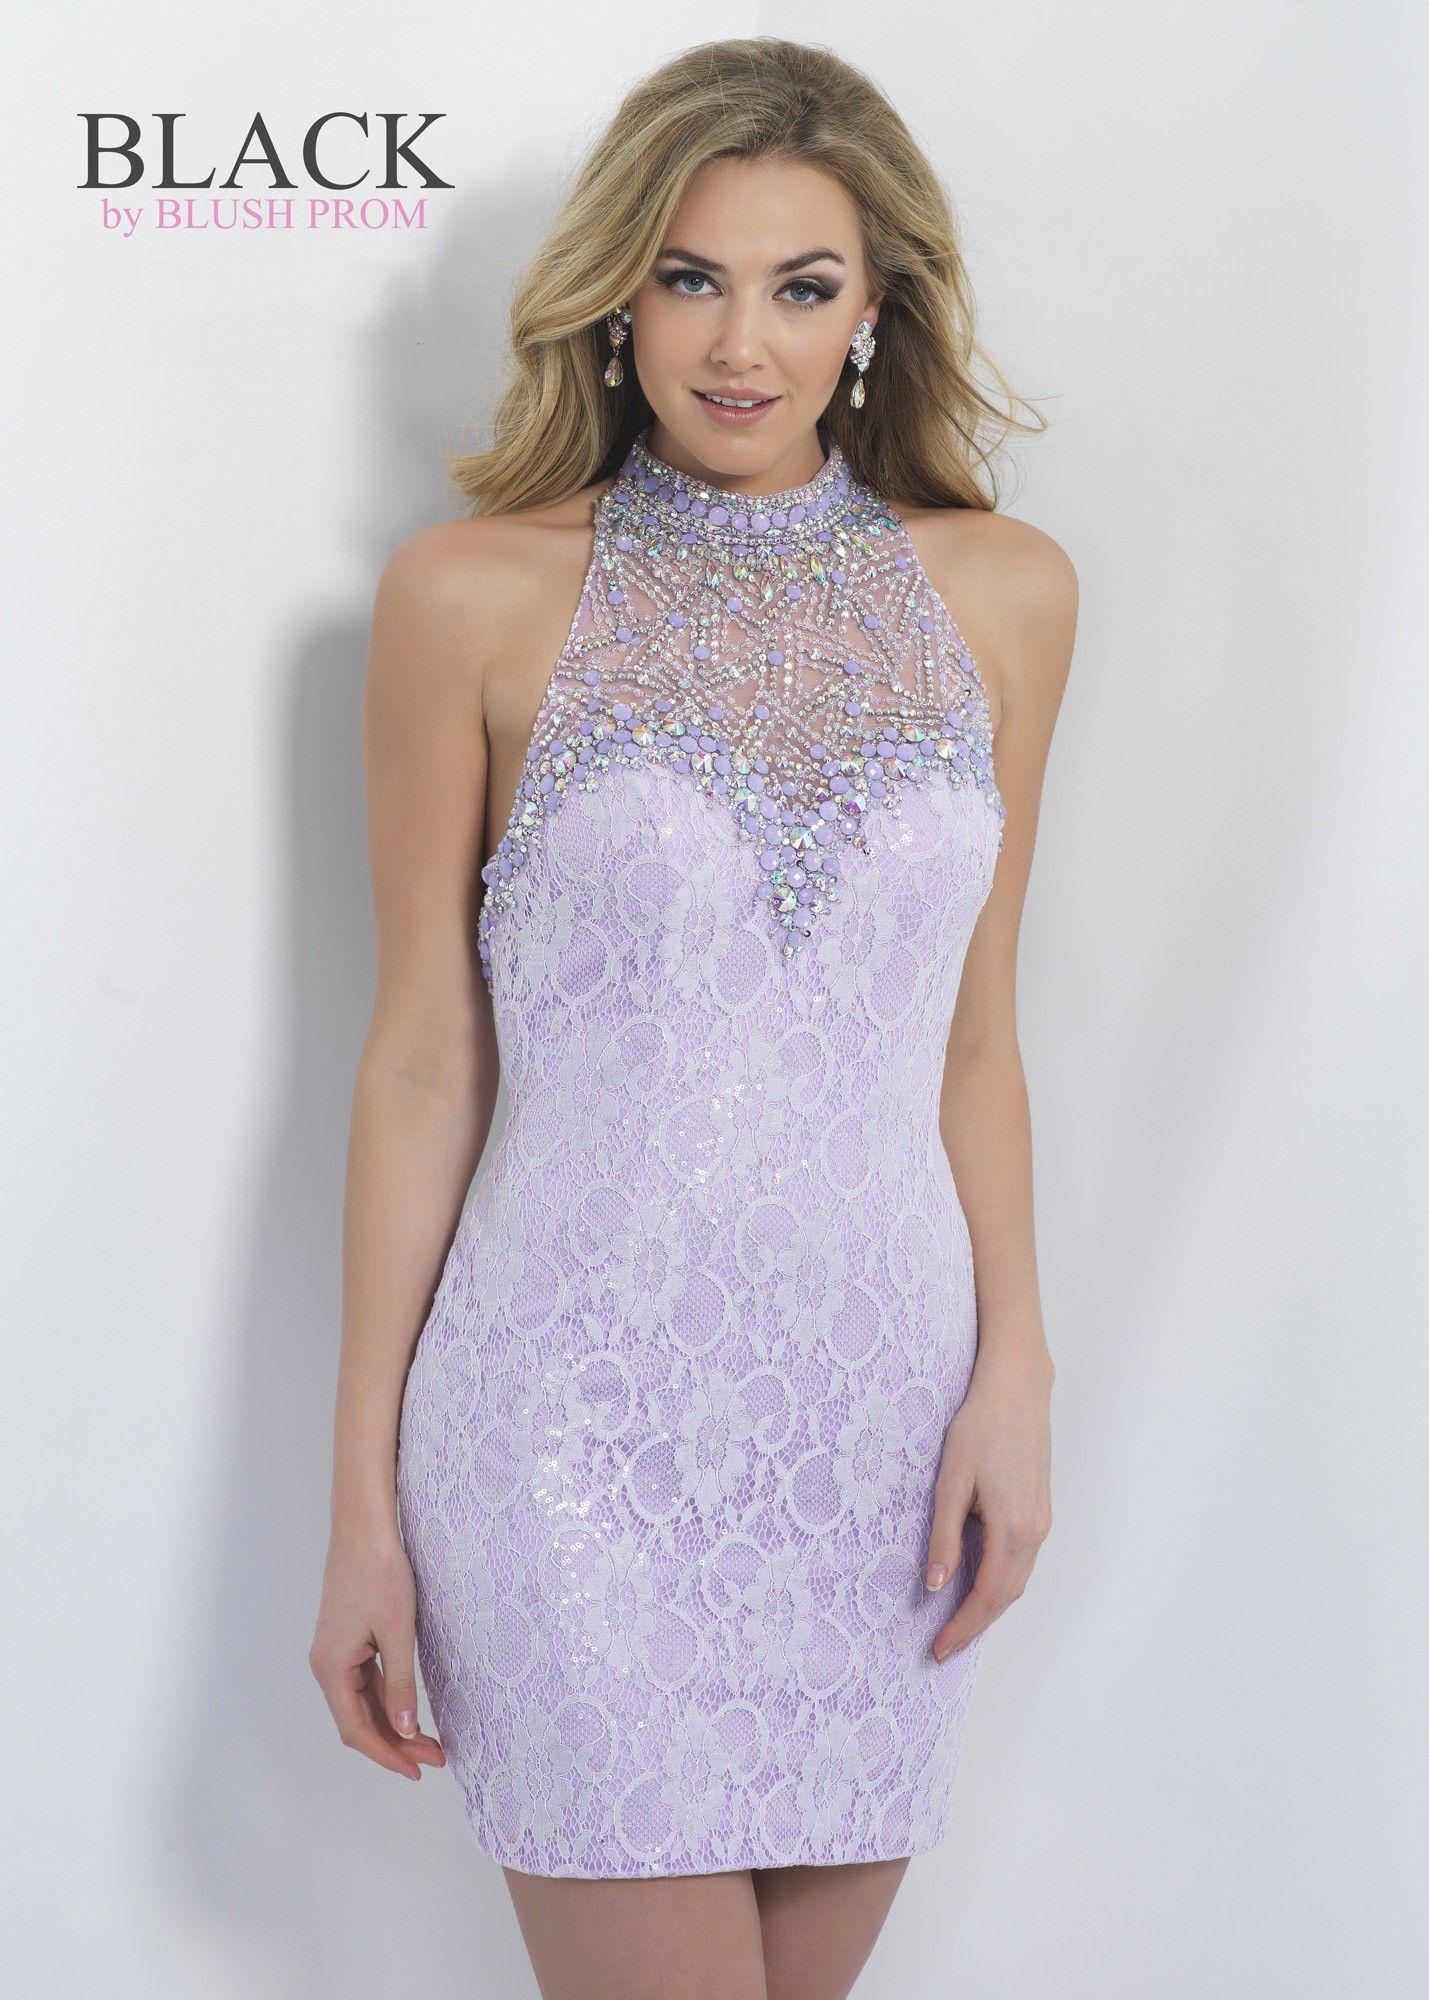 Black by blush c jeweled illusion lace cocktail dress fashion